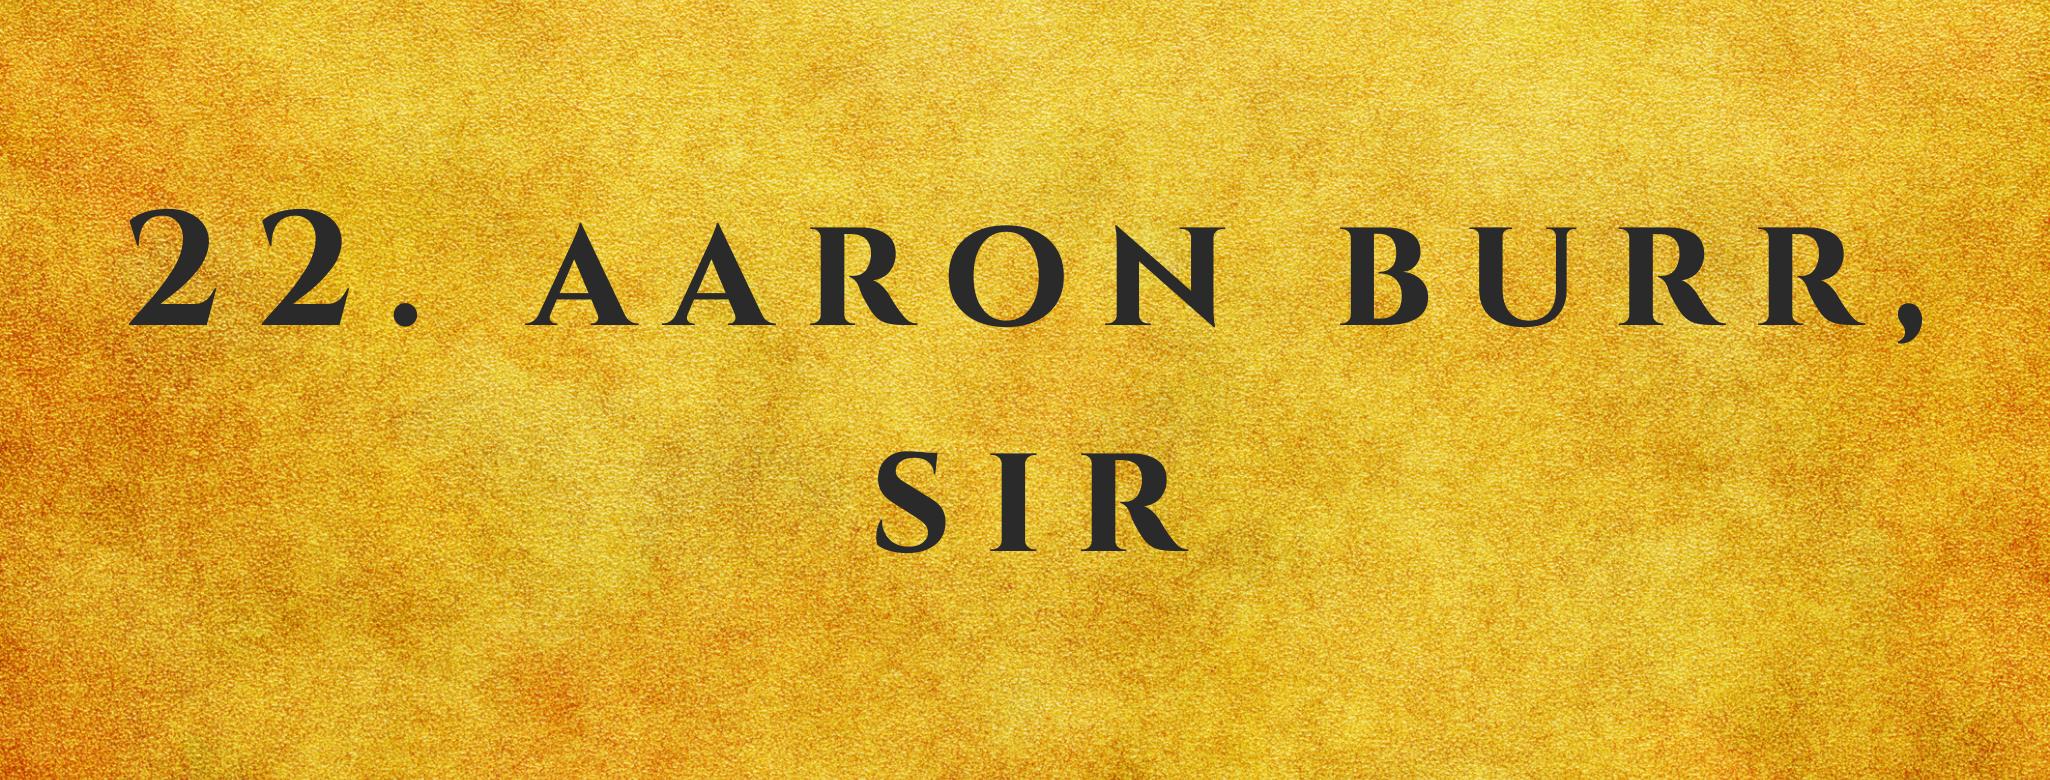 #22 Aaron Burr, Sir